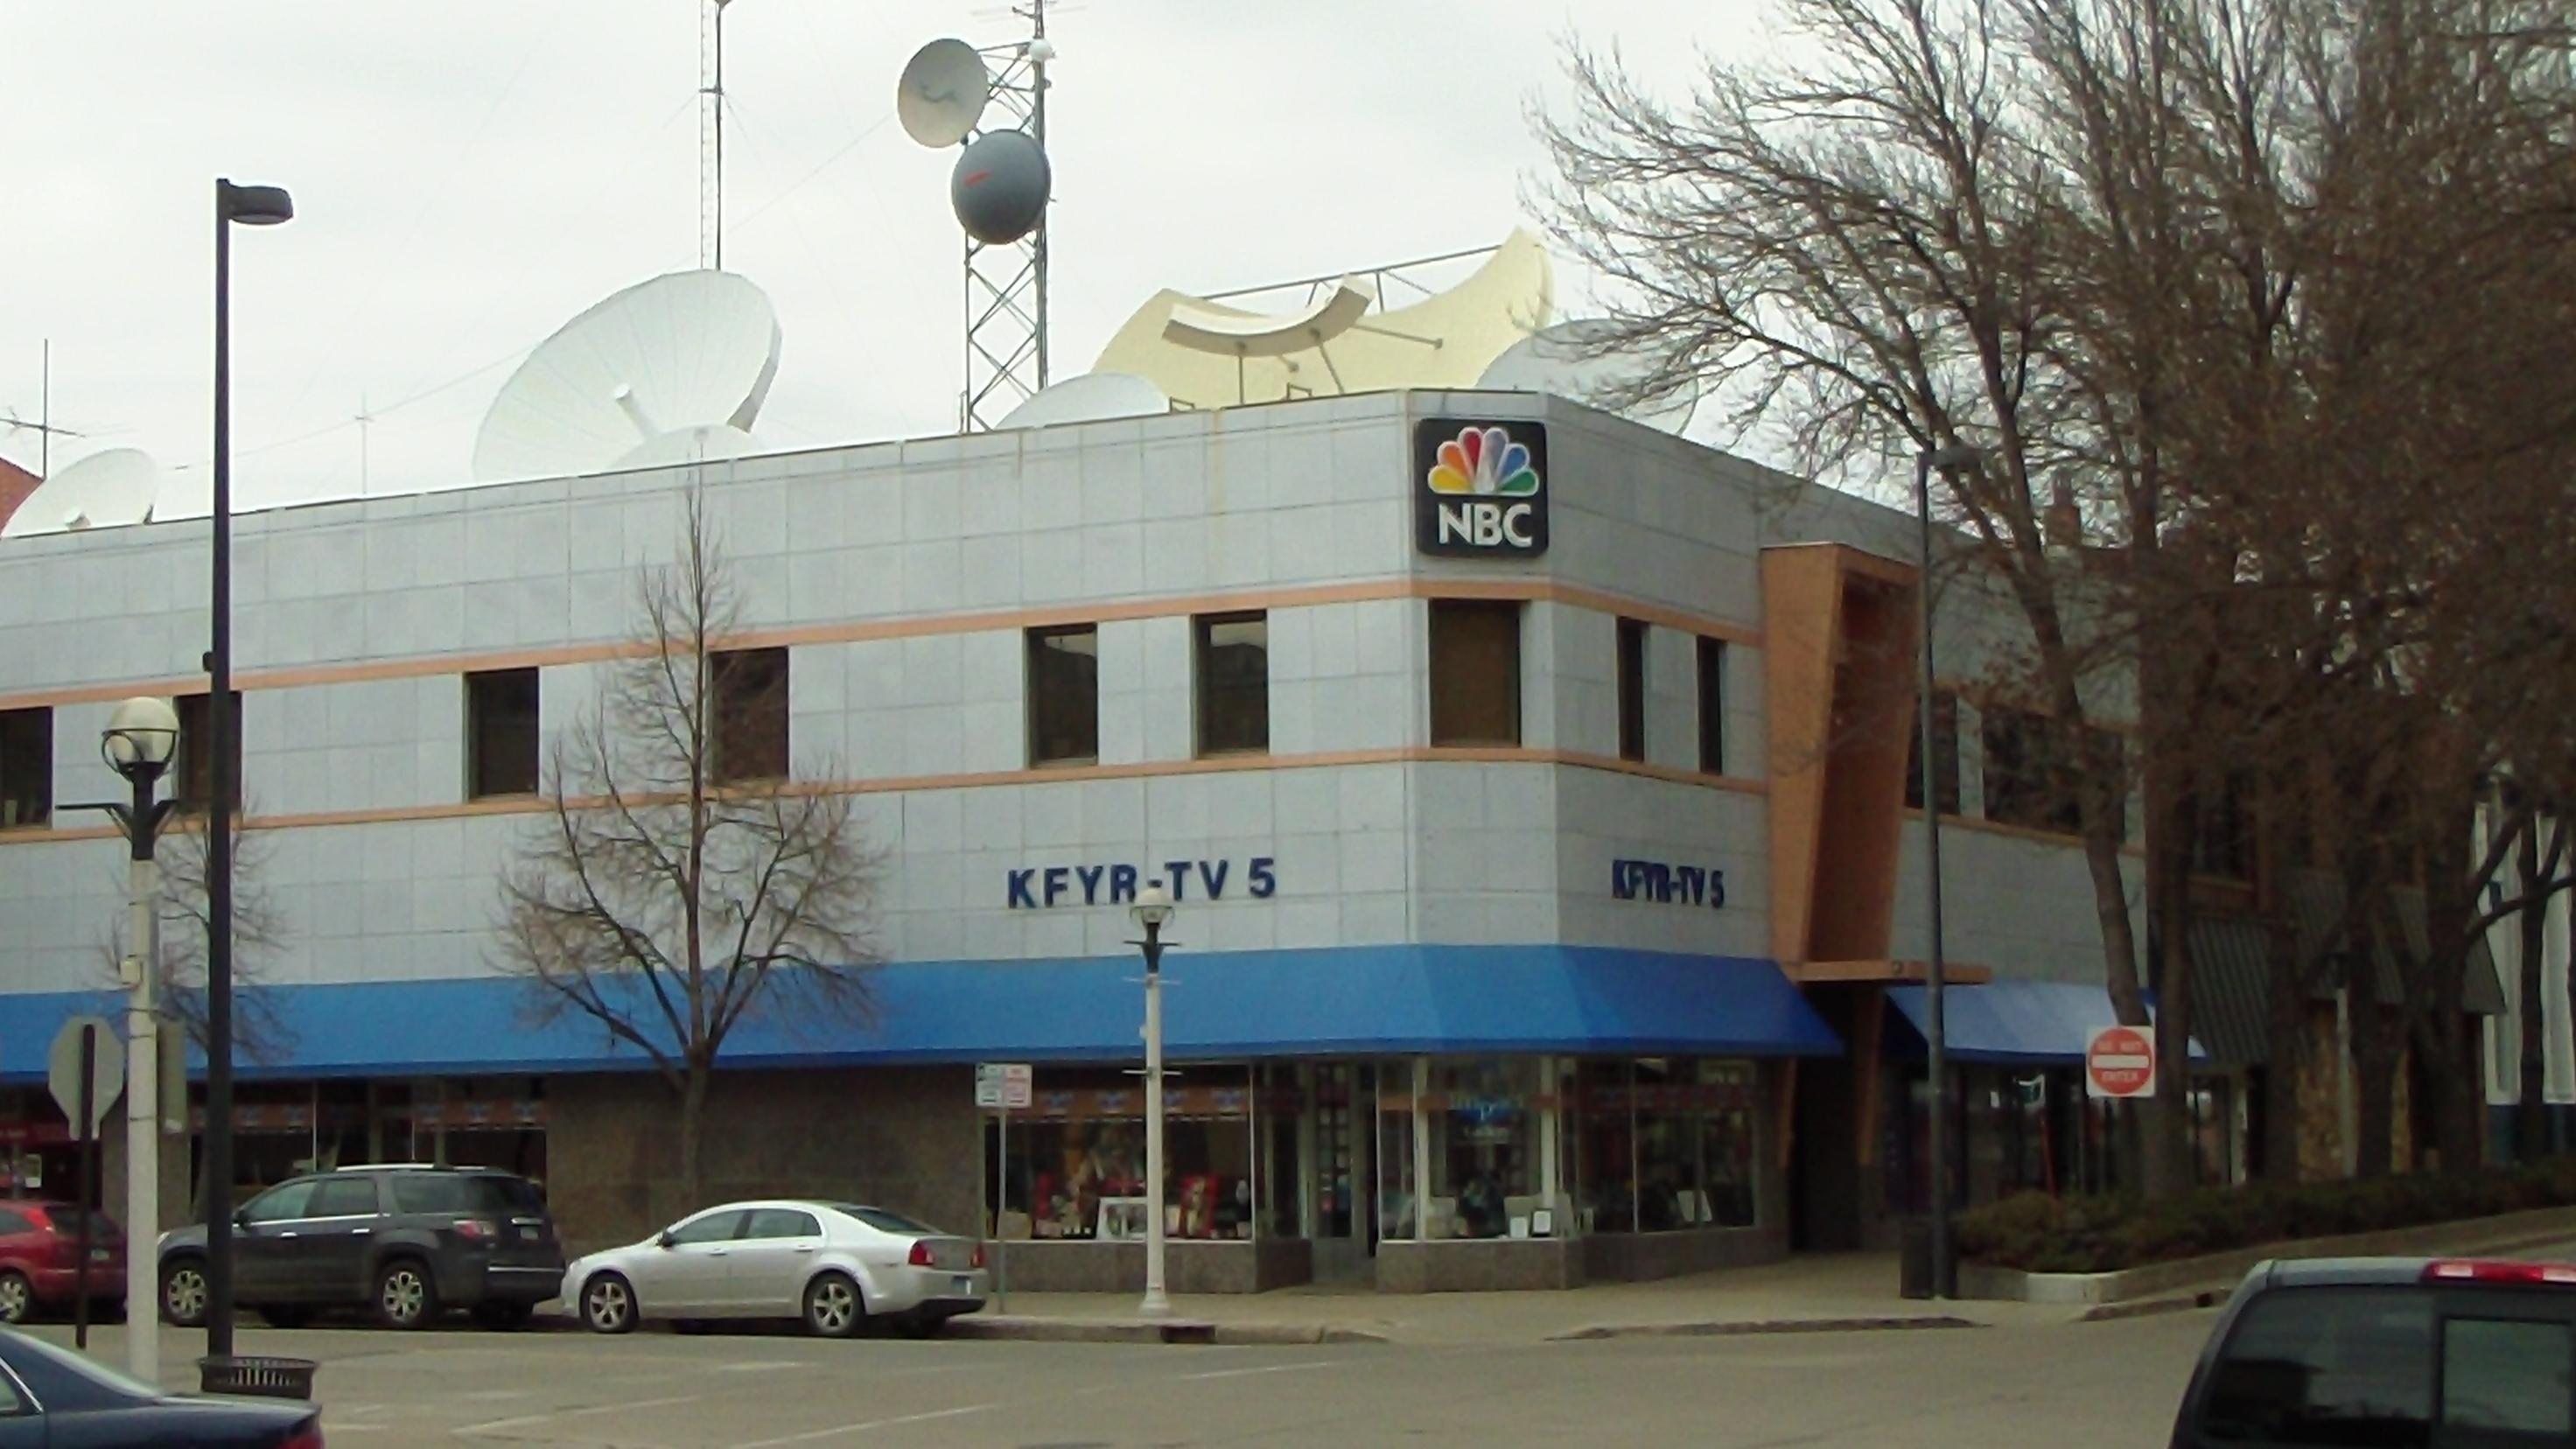 kfyr-tv studio.jpg